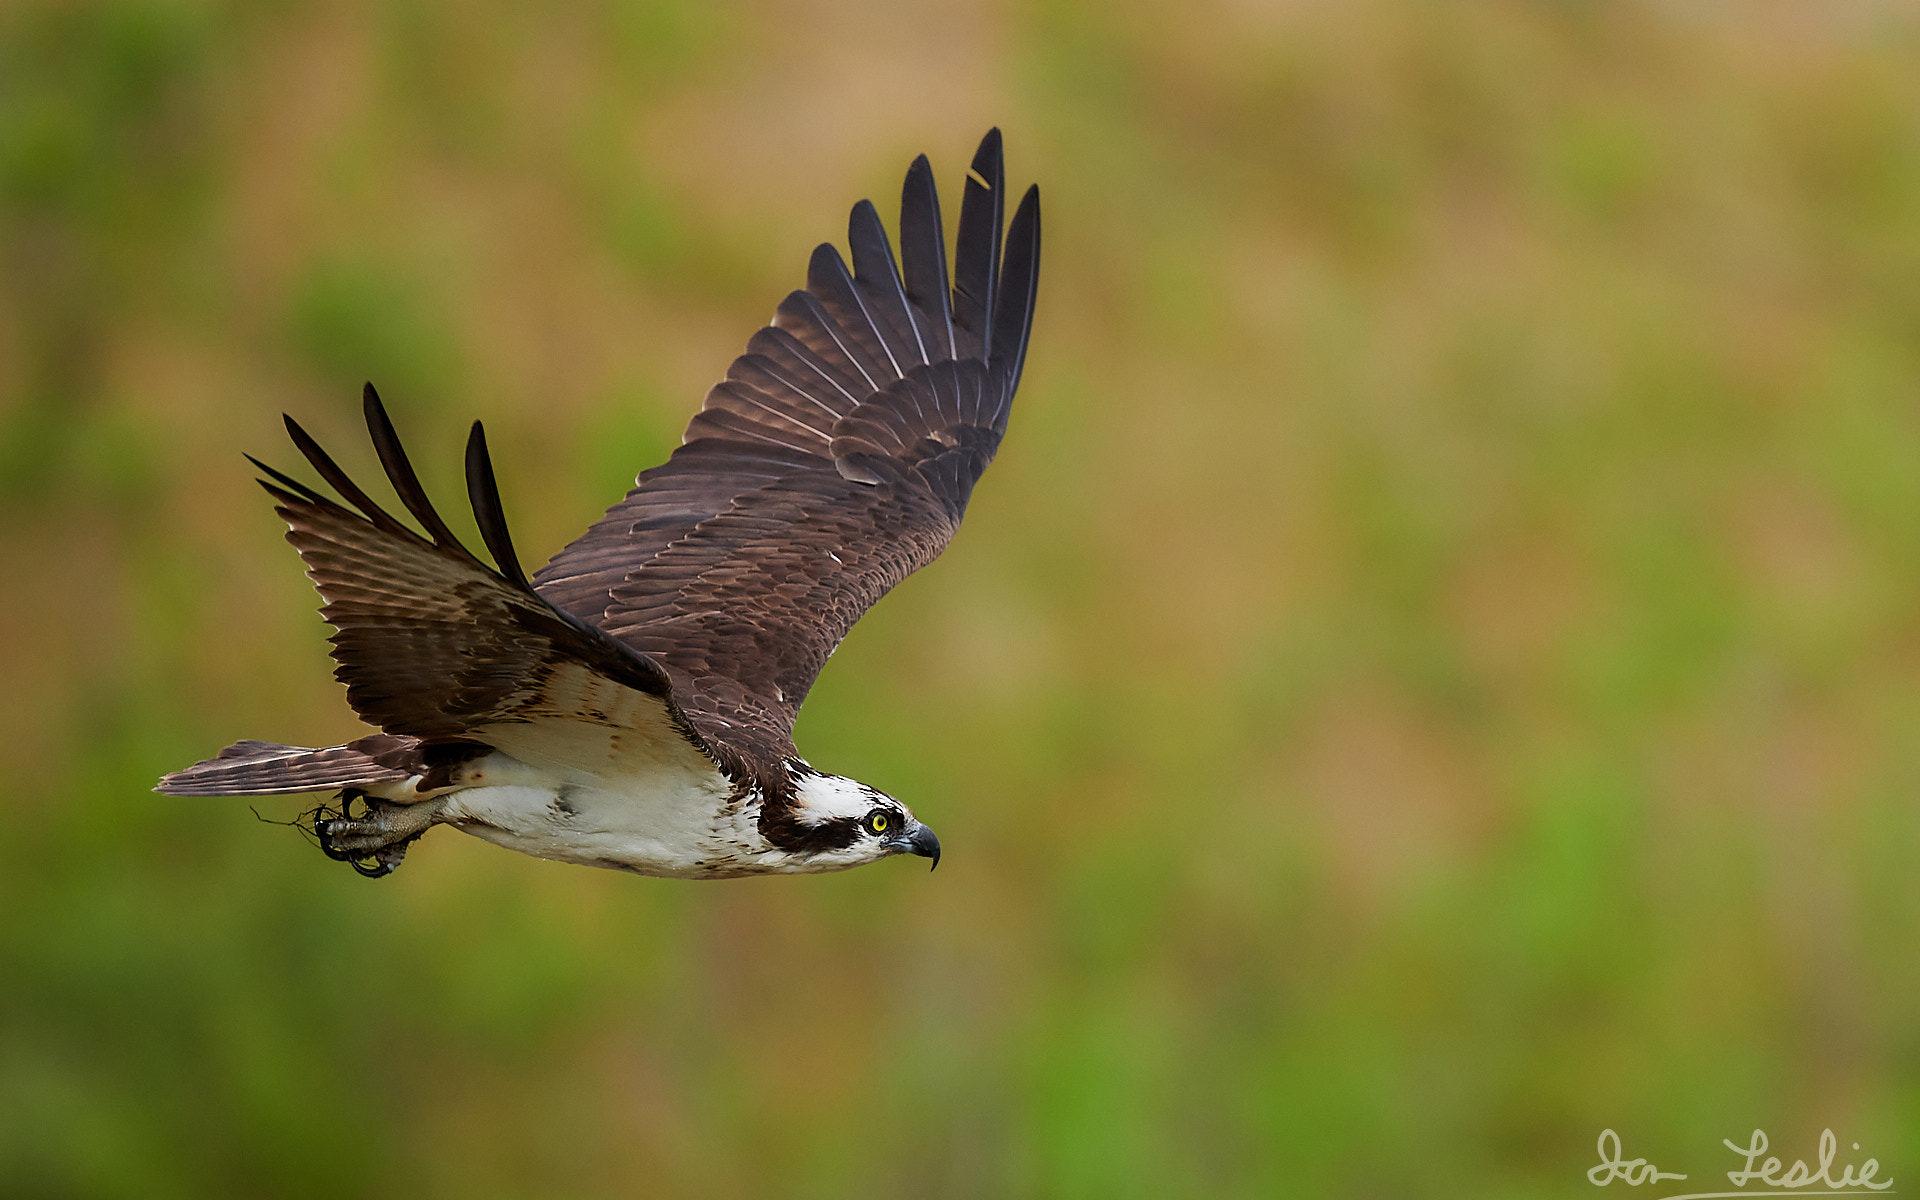 Male Osprey takes flight